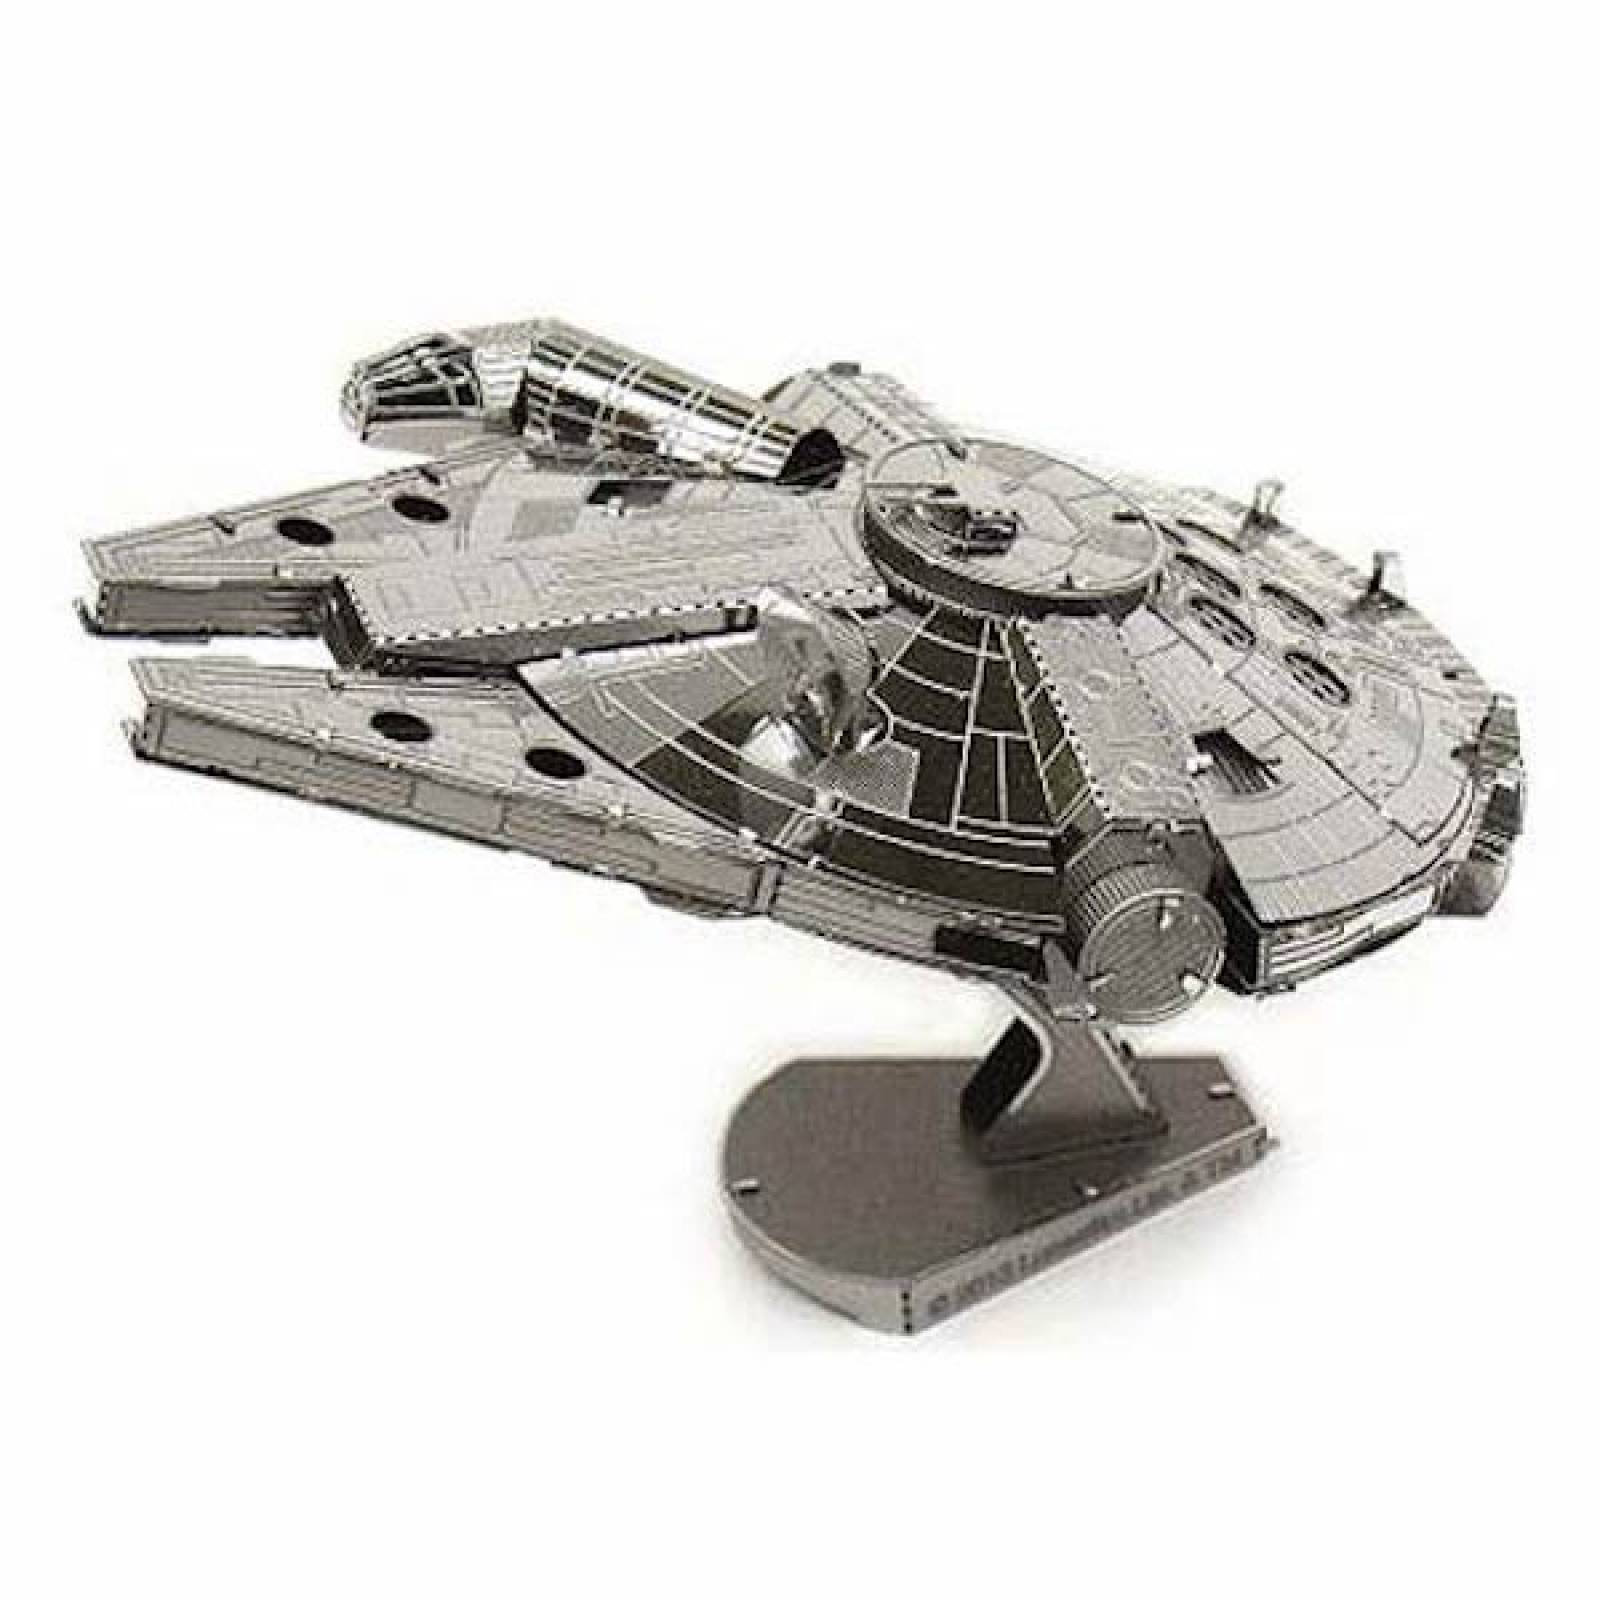 Millenium Falcon - Star Wars Metal Earth 3D Model Kit